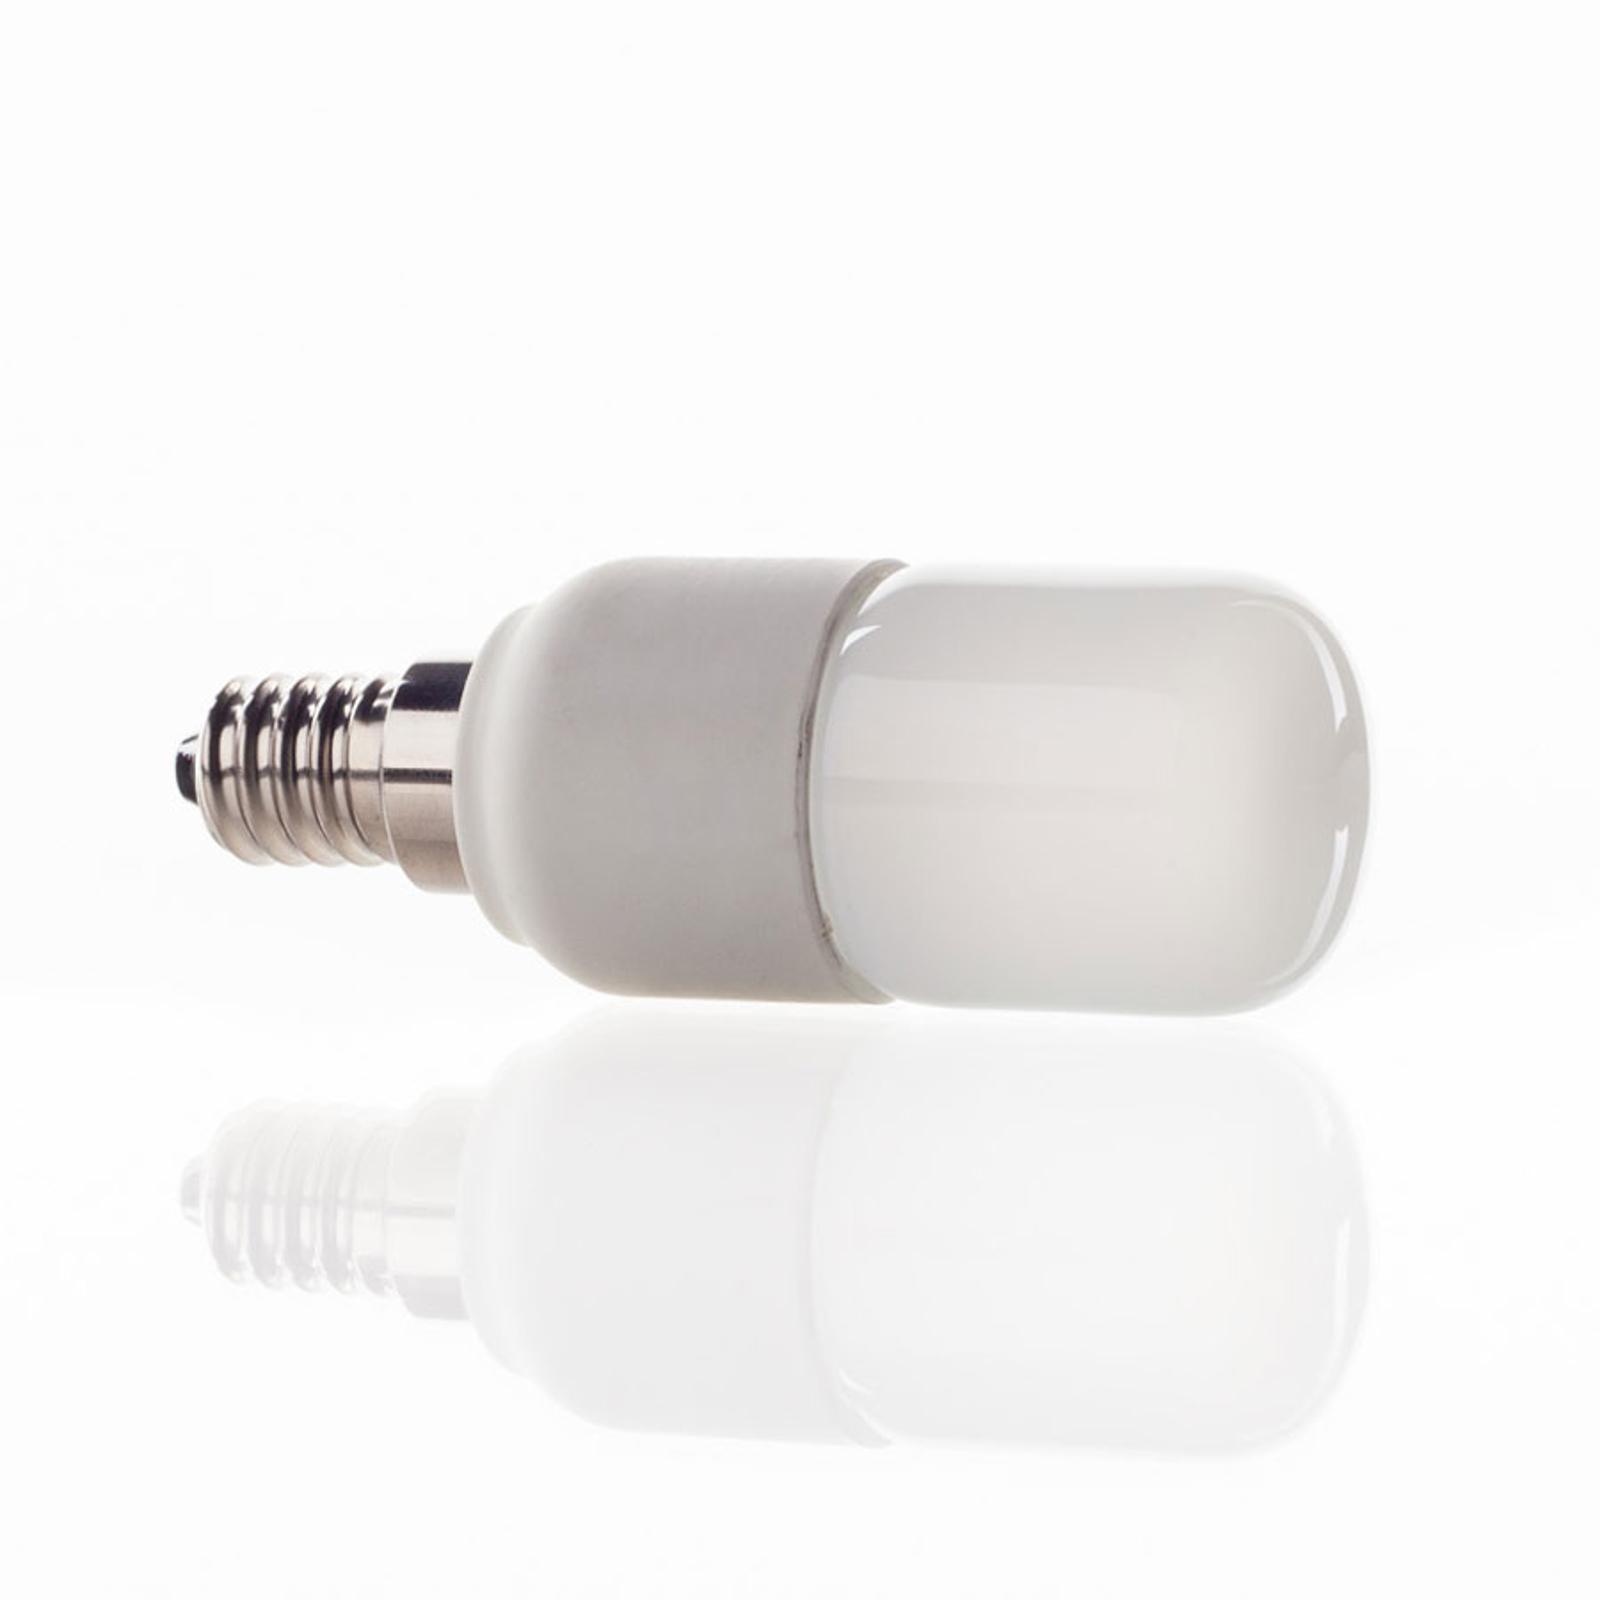 E14 4W LED-lampa i rörform